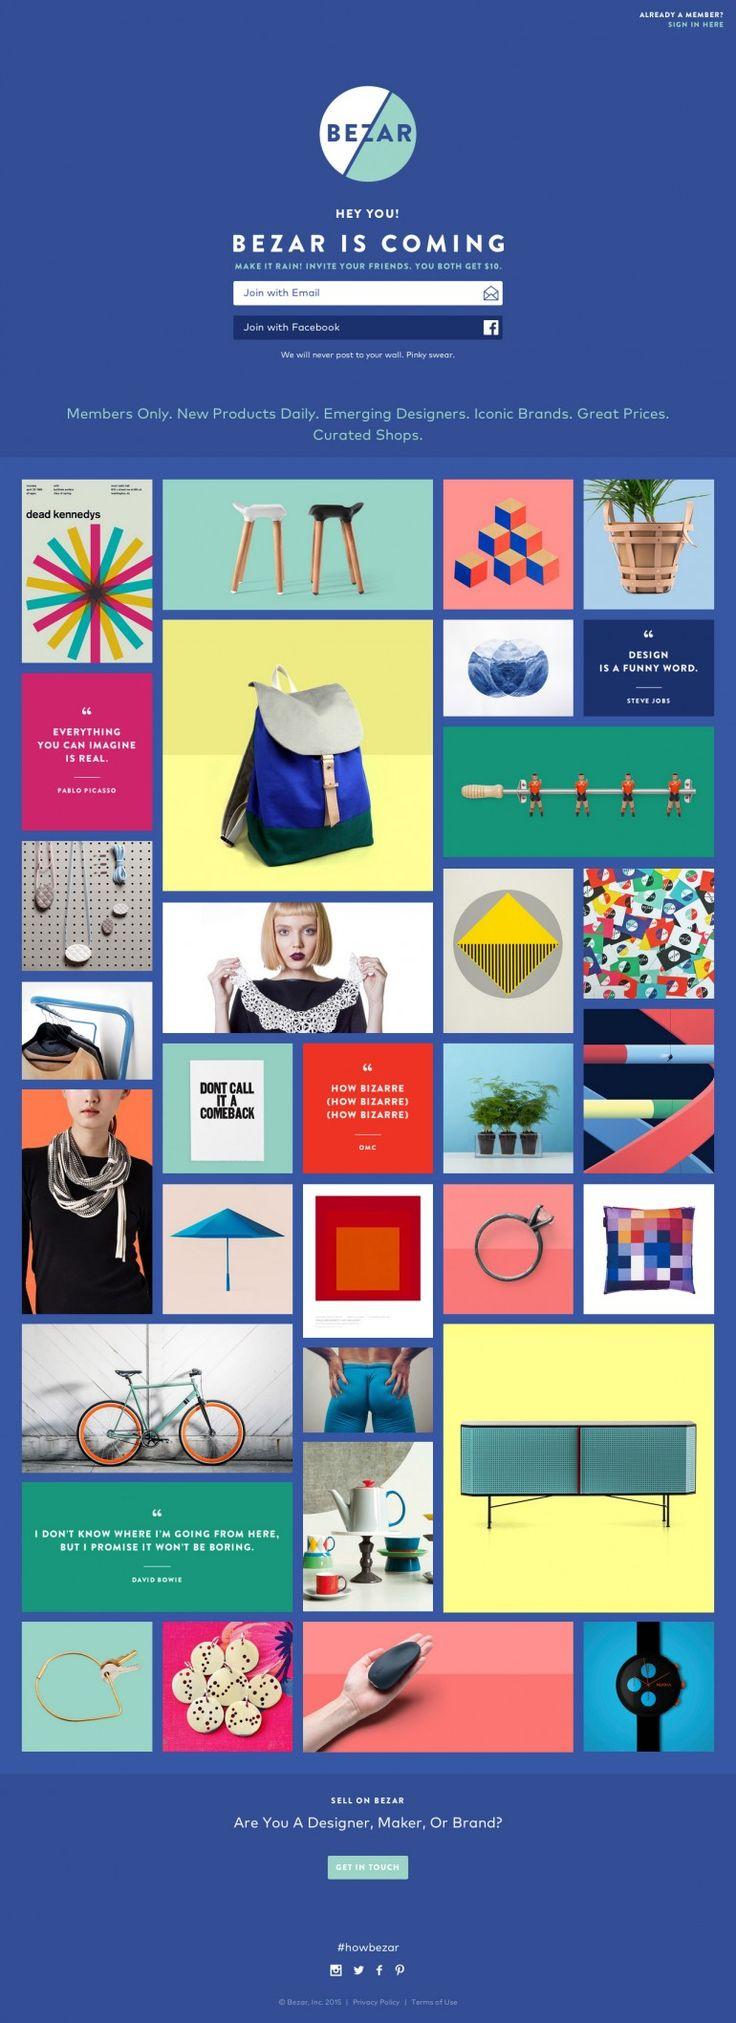 Bezar – Colorful landing page